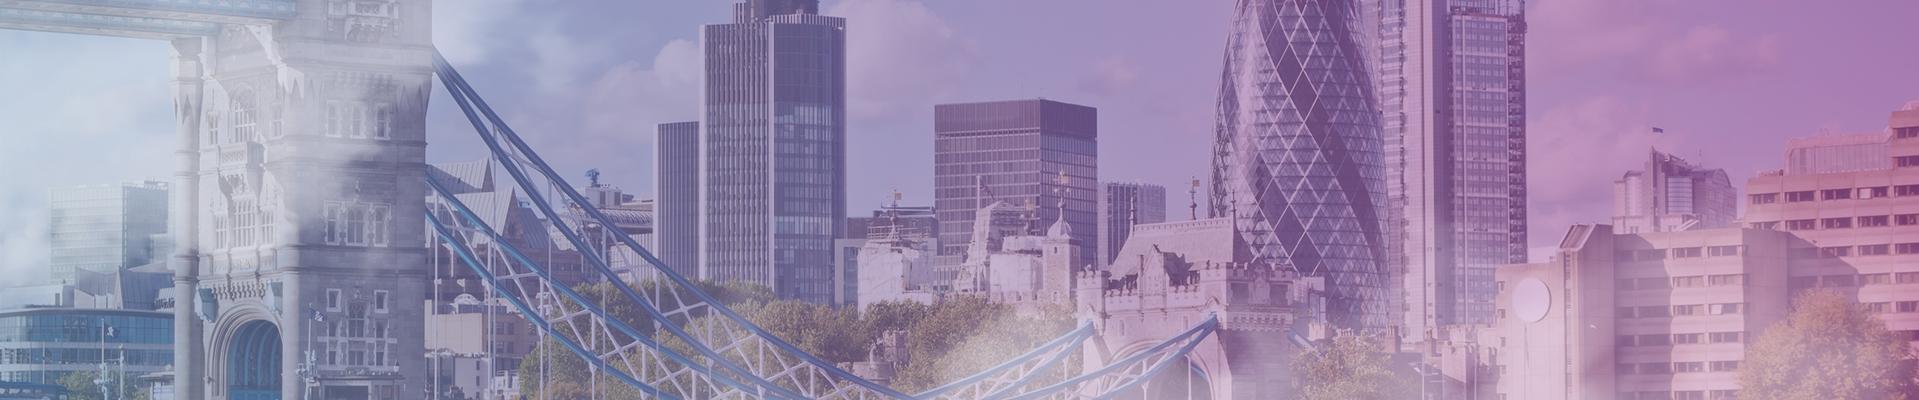 banner_london